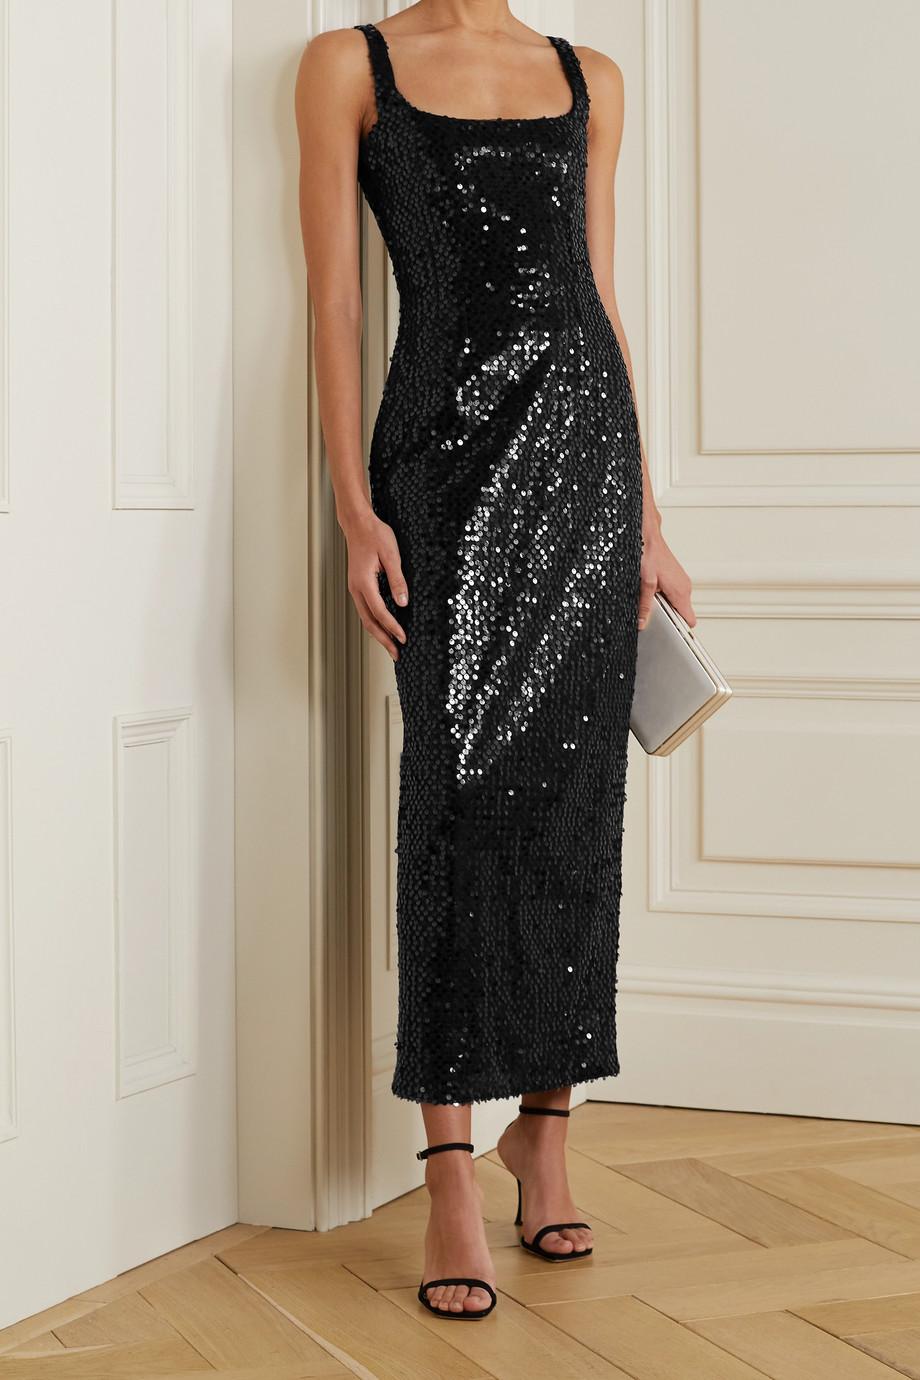 Emilia Wickstead Bassett sequined tulle dress